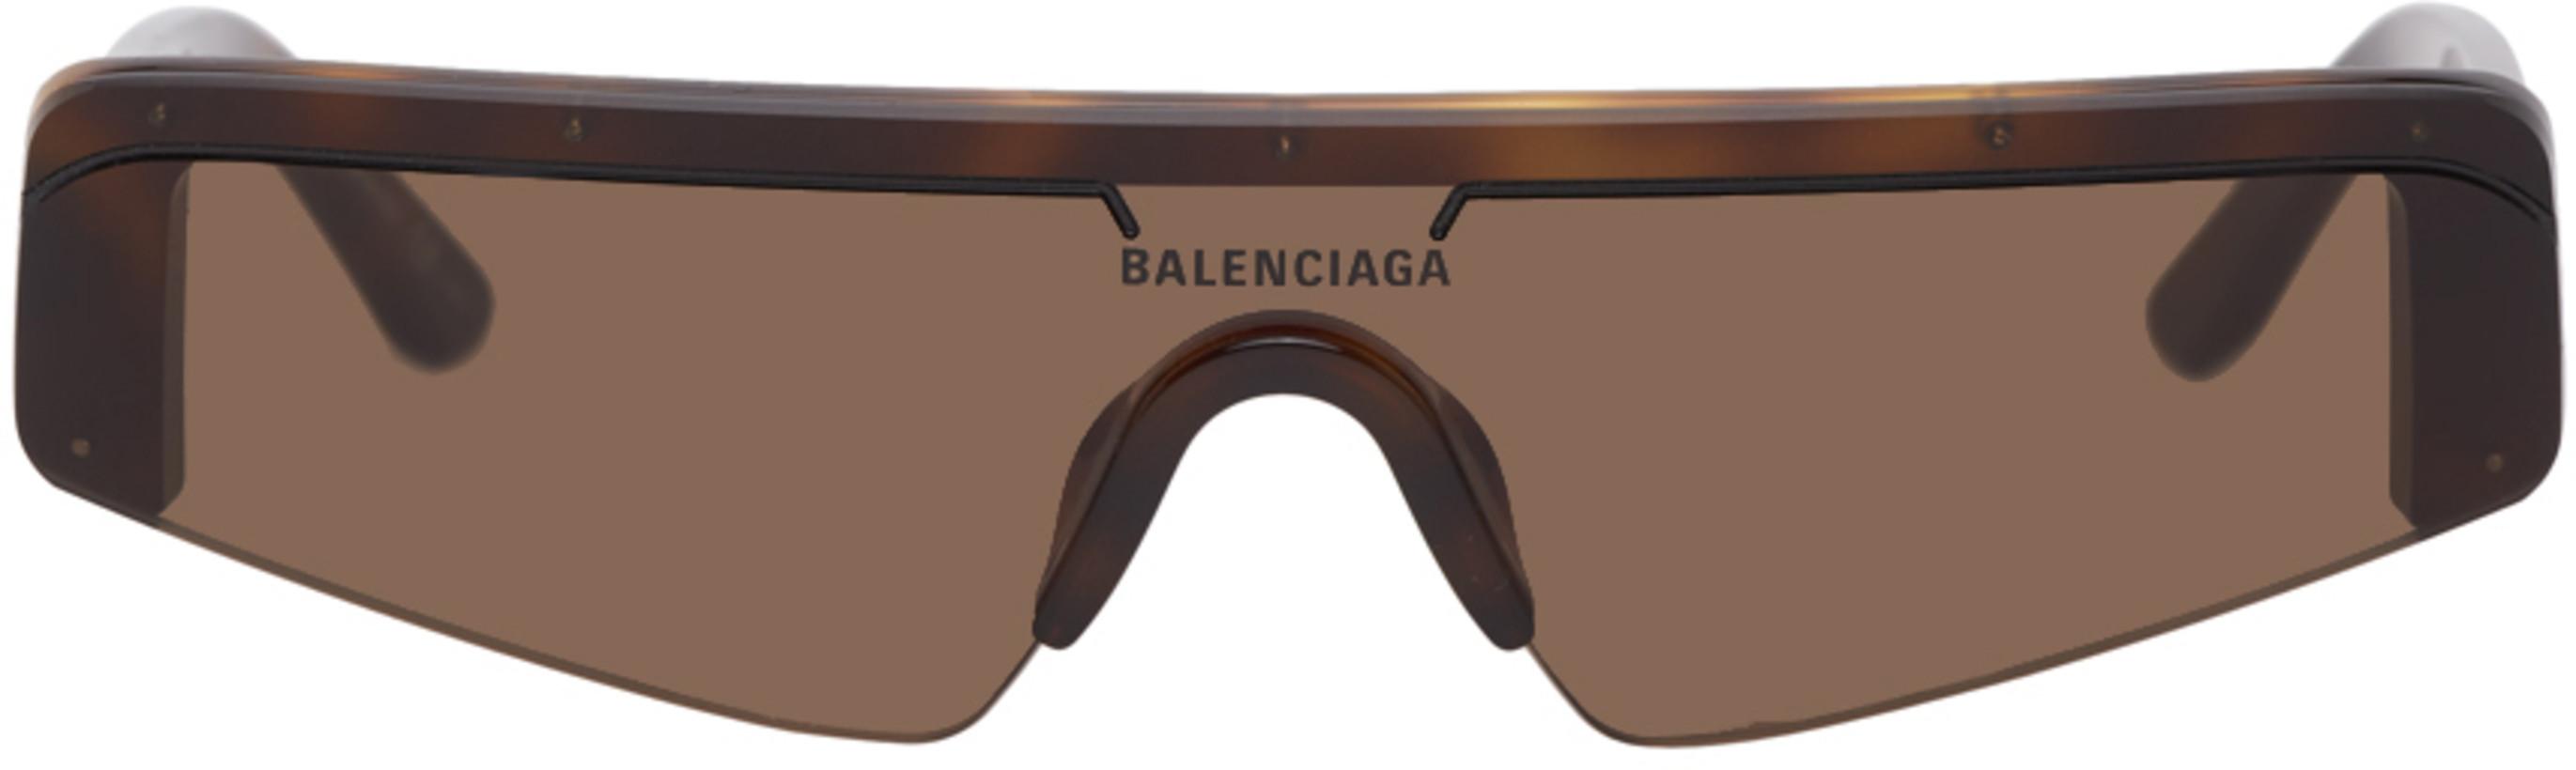 Balenciaga Brown Mask Sunglasses